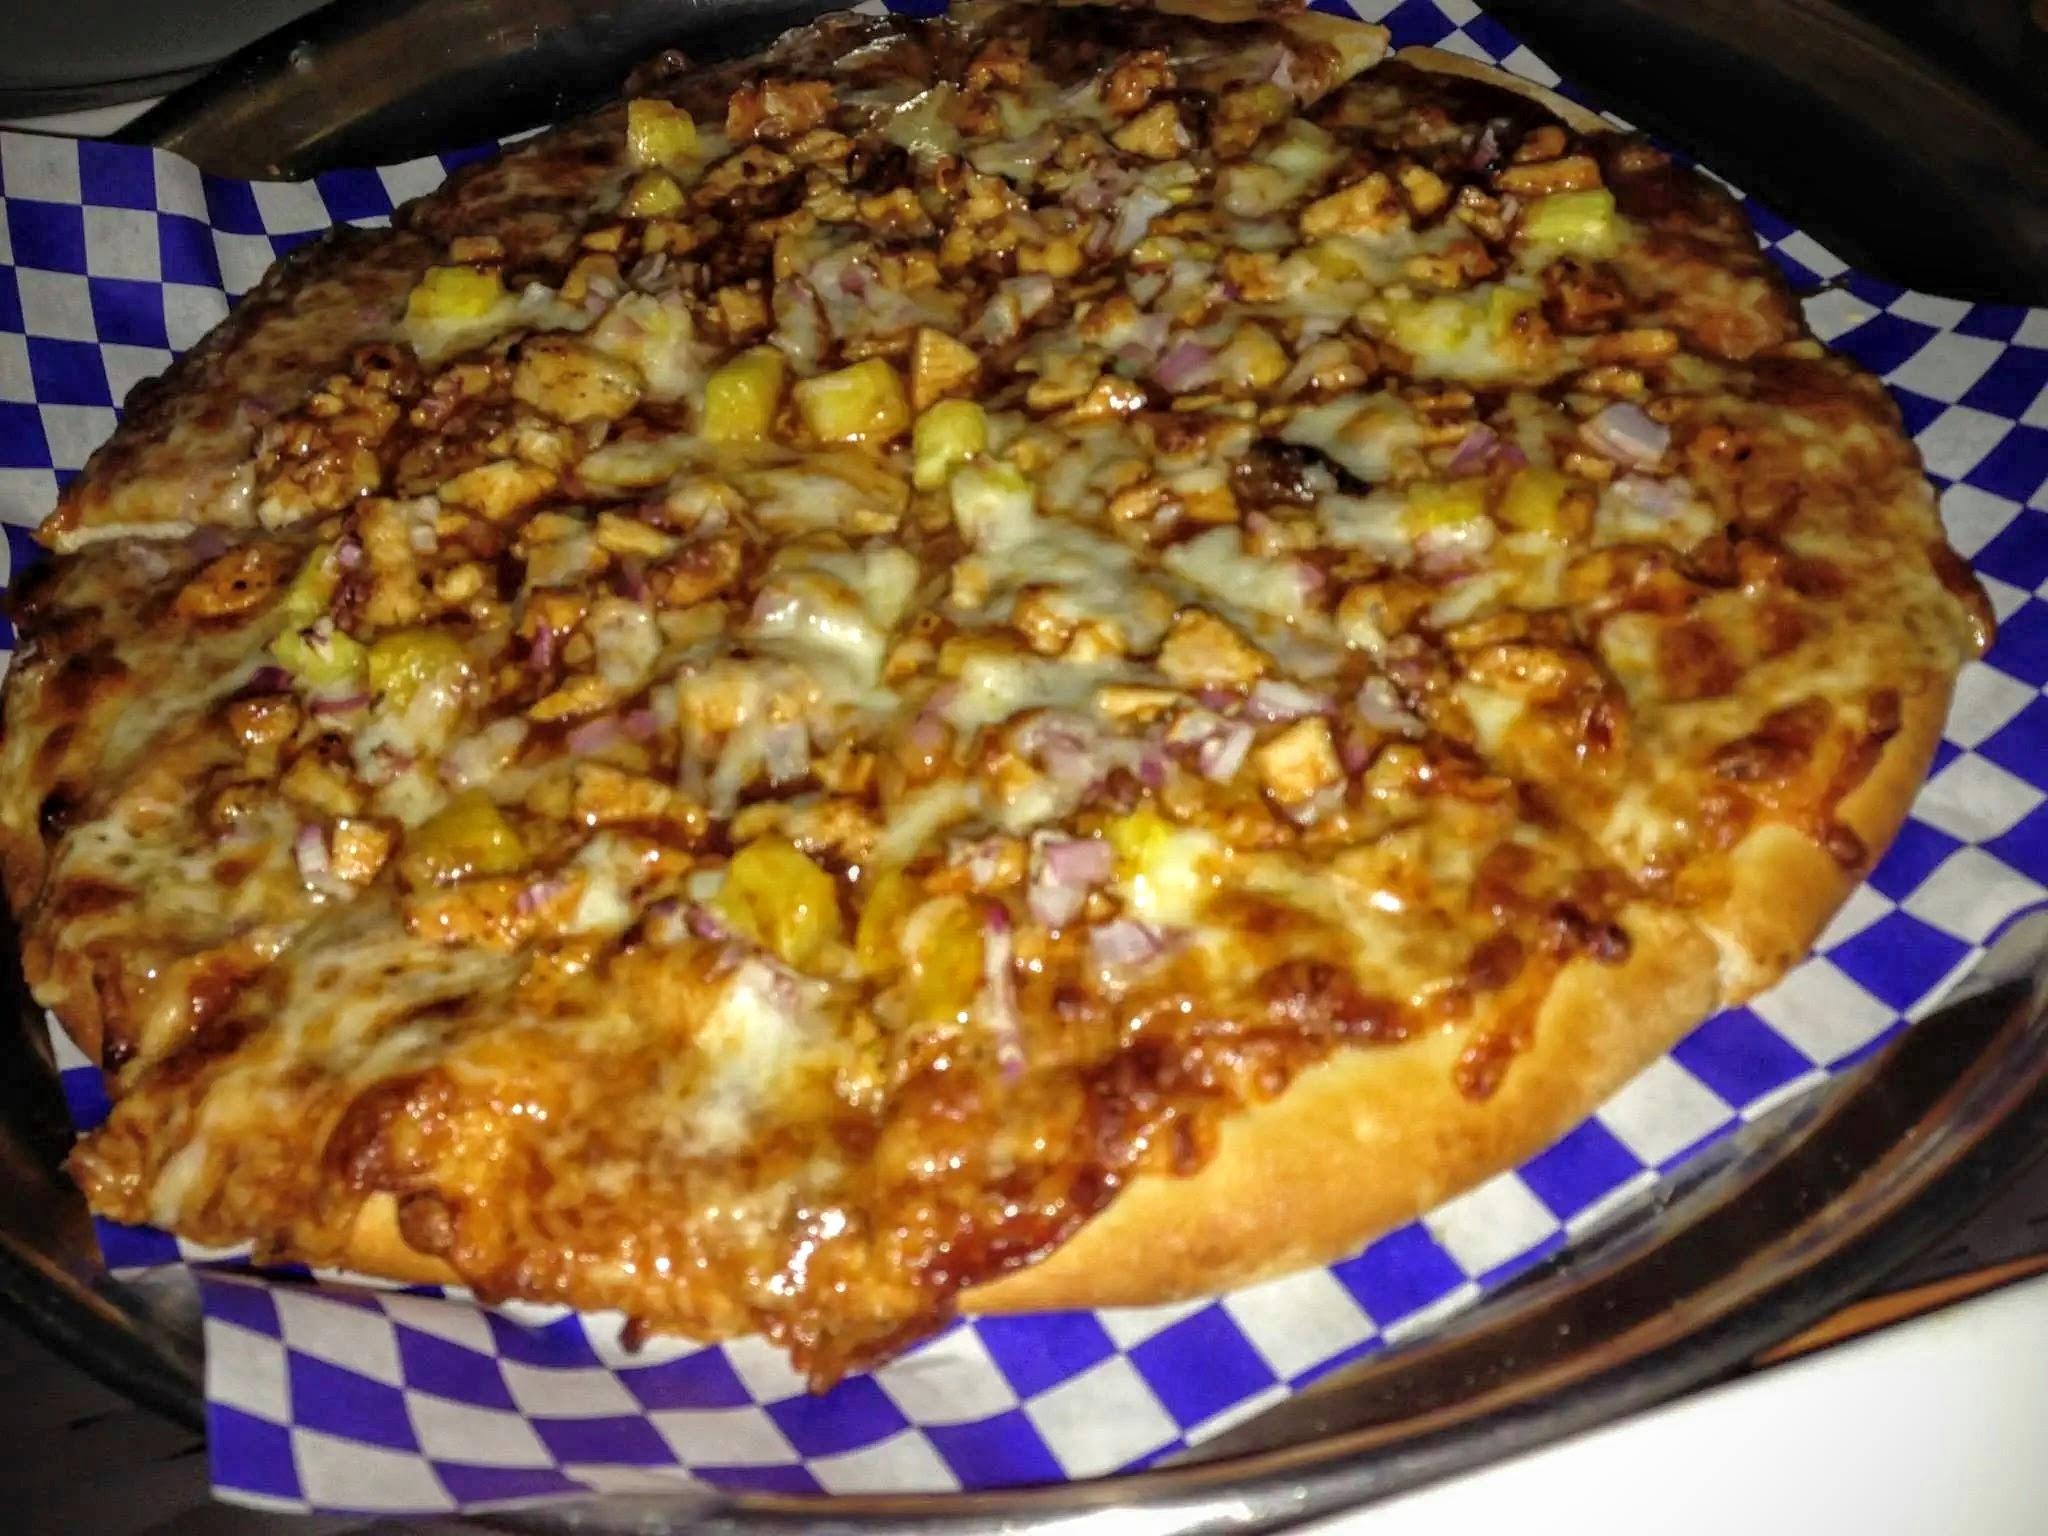 The BBQ Pelican Bay Pizza - Chicken, Onion, Pineapple, BBQ Sauce